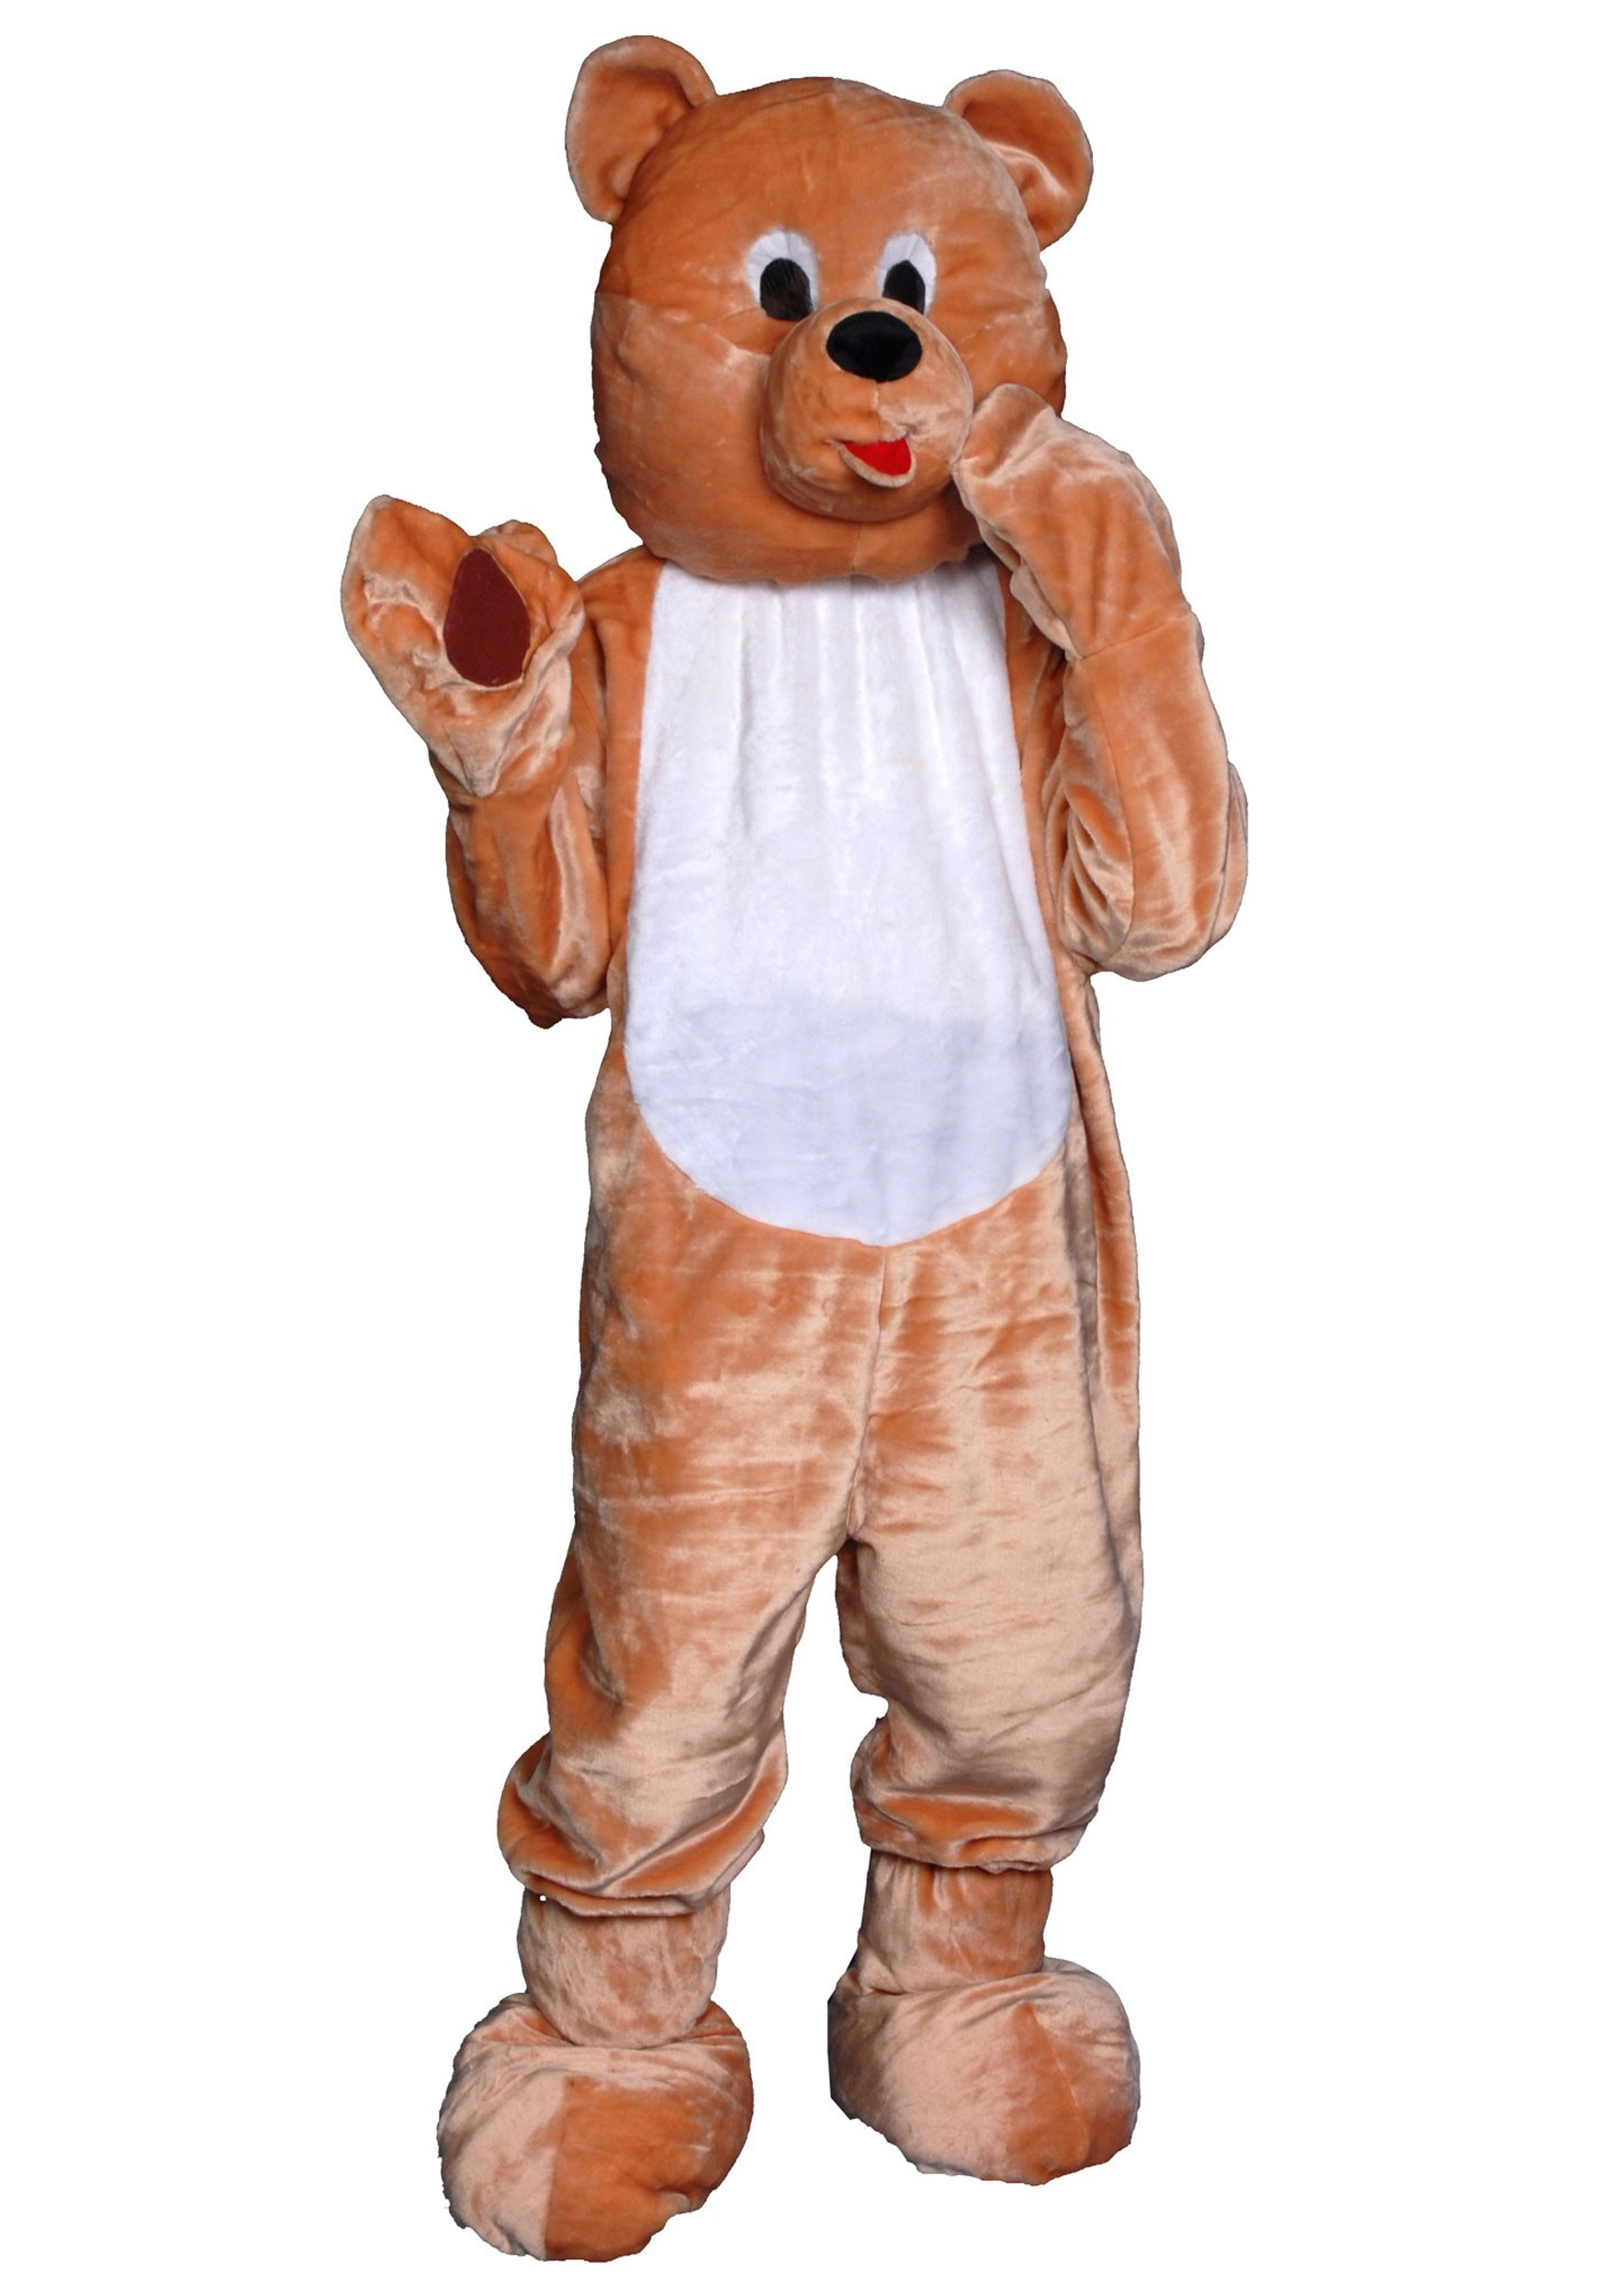 Adult Teddy Bear Mascot Costume  sc 1 st  Halloween Costumes & Adult Teddy Bear Mascot Costume - Halloween Costumes